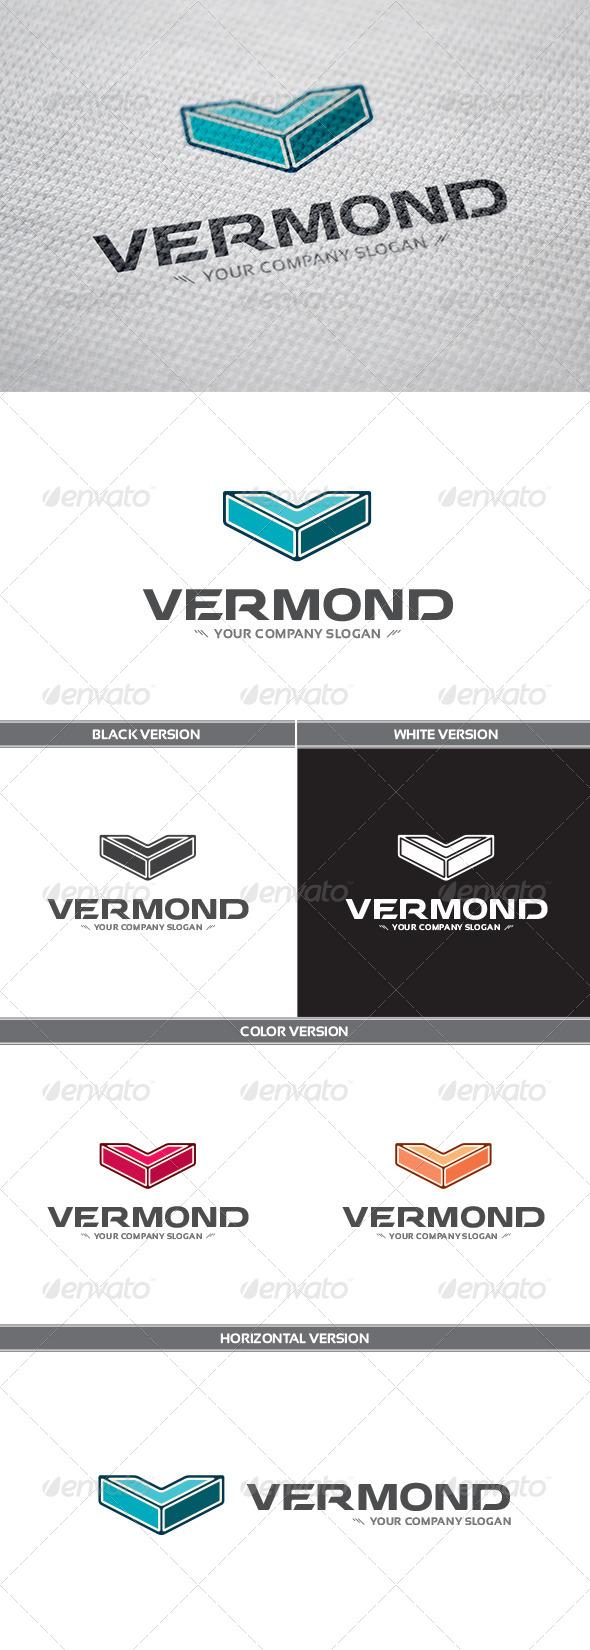 GraphicRiver Vermond Logo 8320465